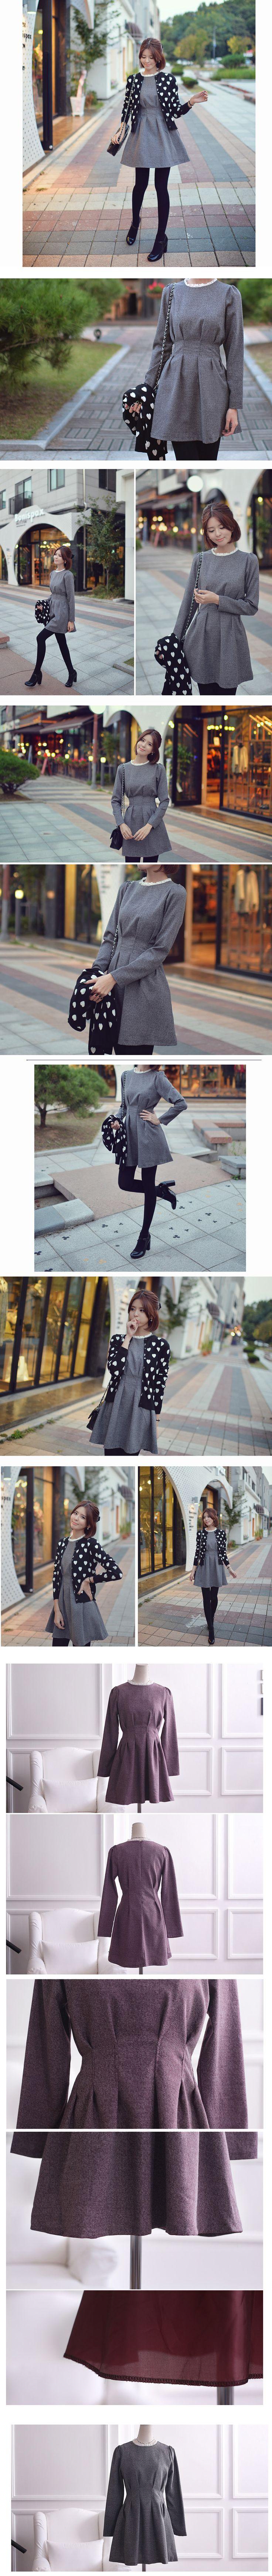 ba) メリージェーンラインワンピース(2色) - 韓国ファッション通販【セレクトショップKii-Na】キーナ